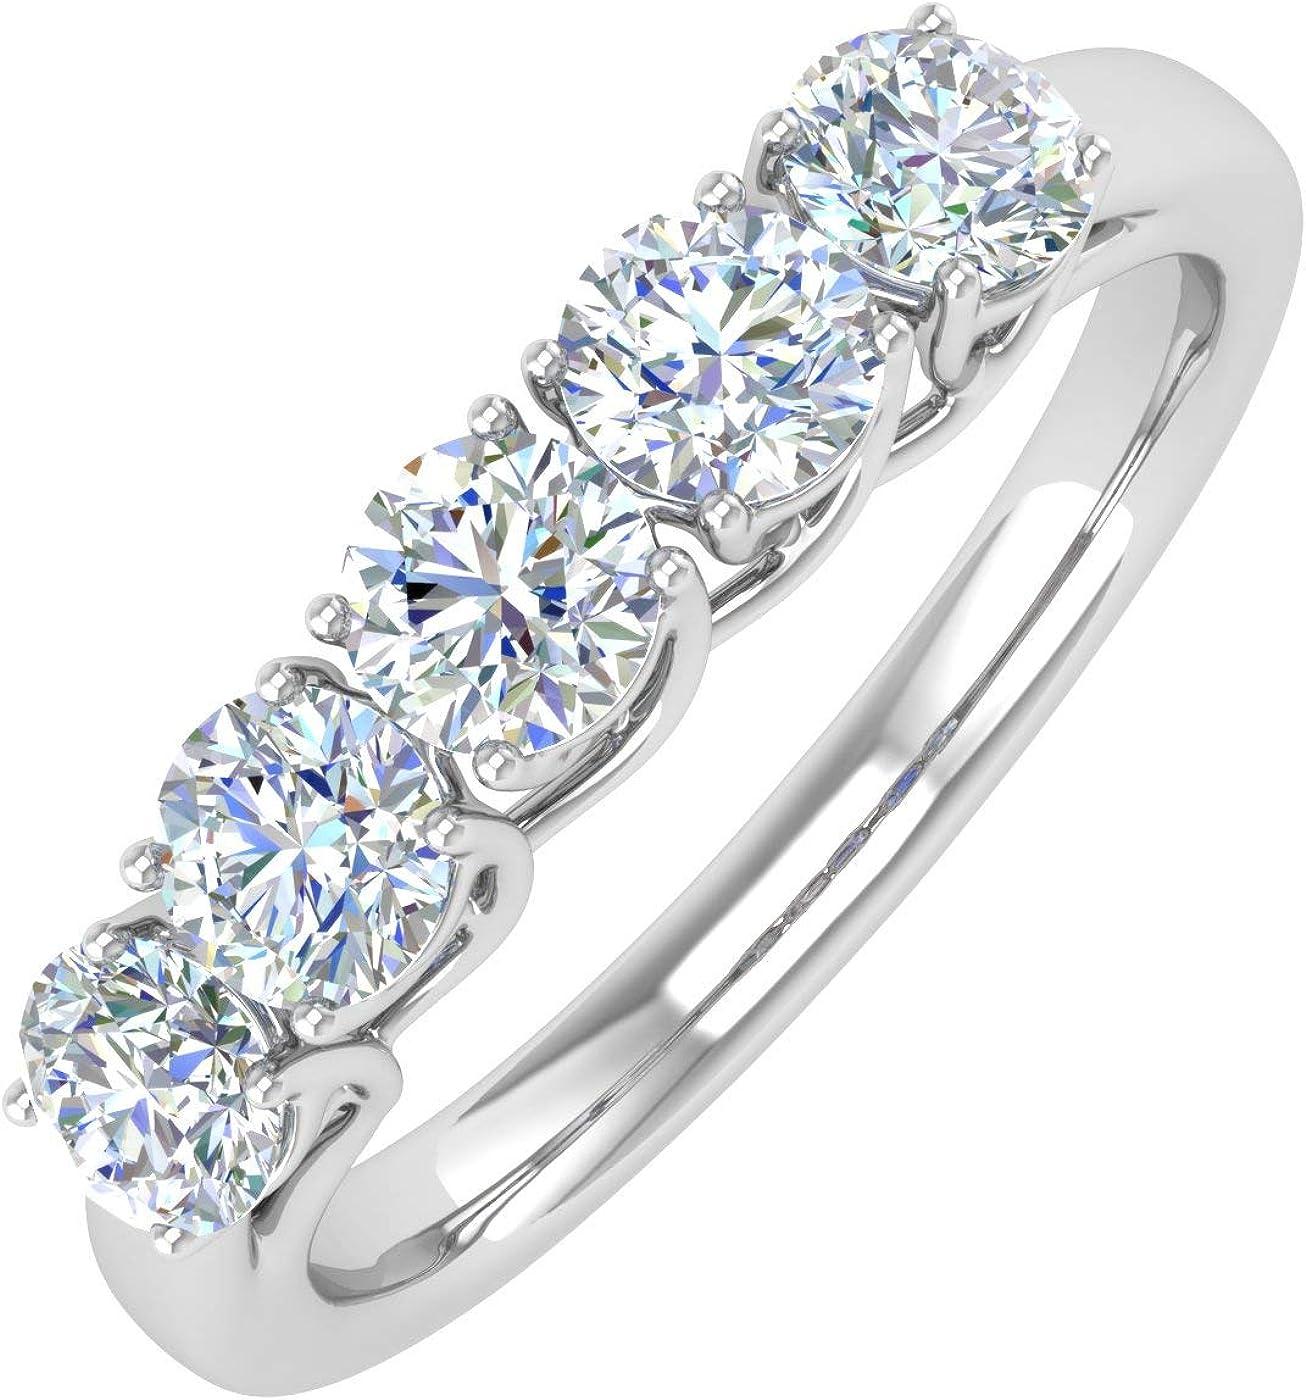 1 Carat 5-Stone Diamond Wedding Band Ring in 14K Gold